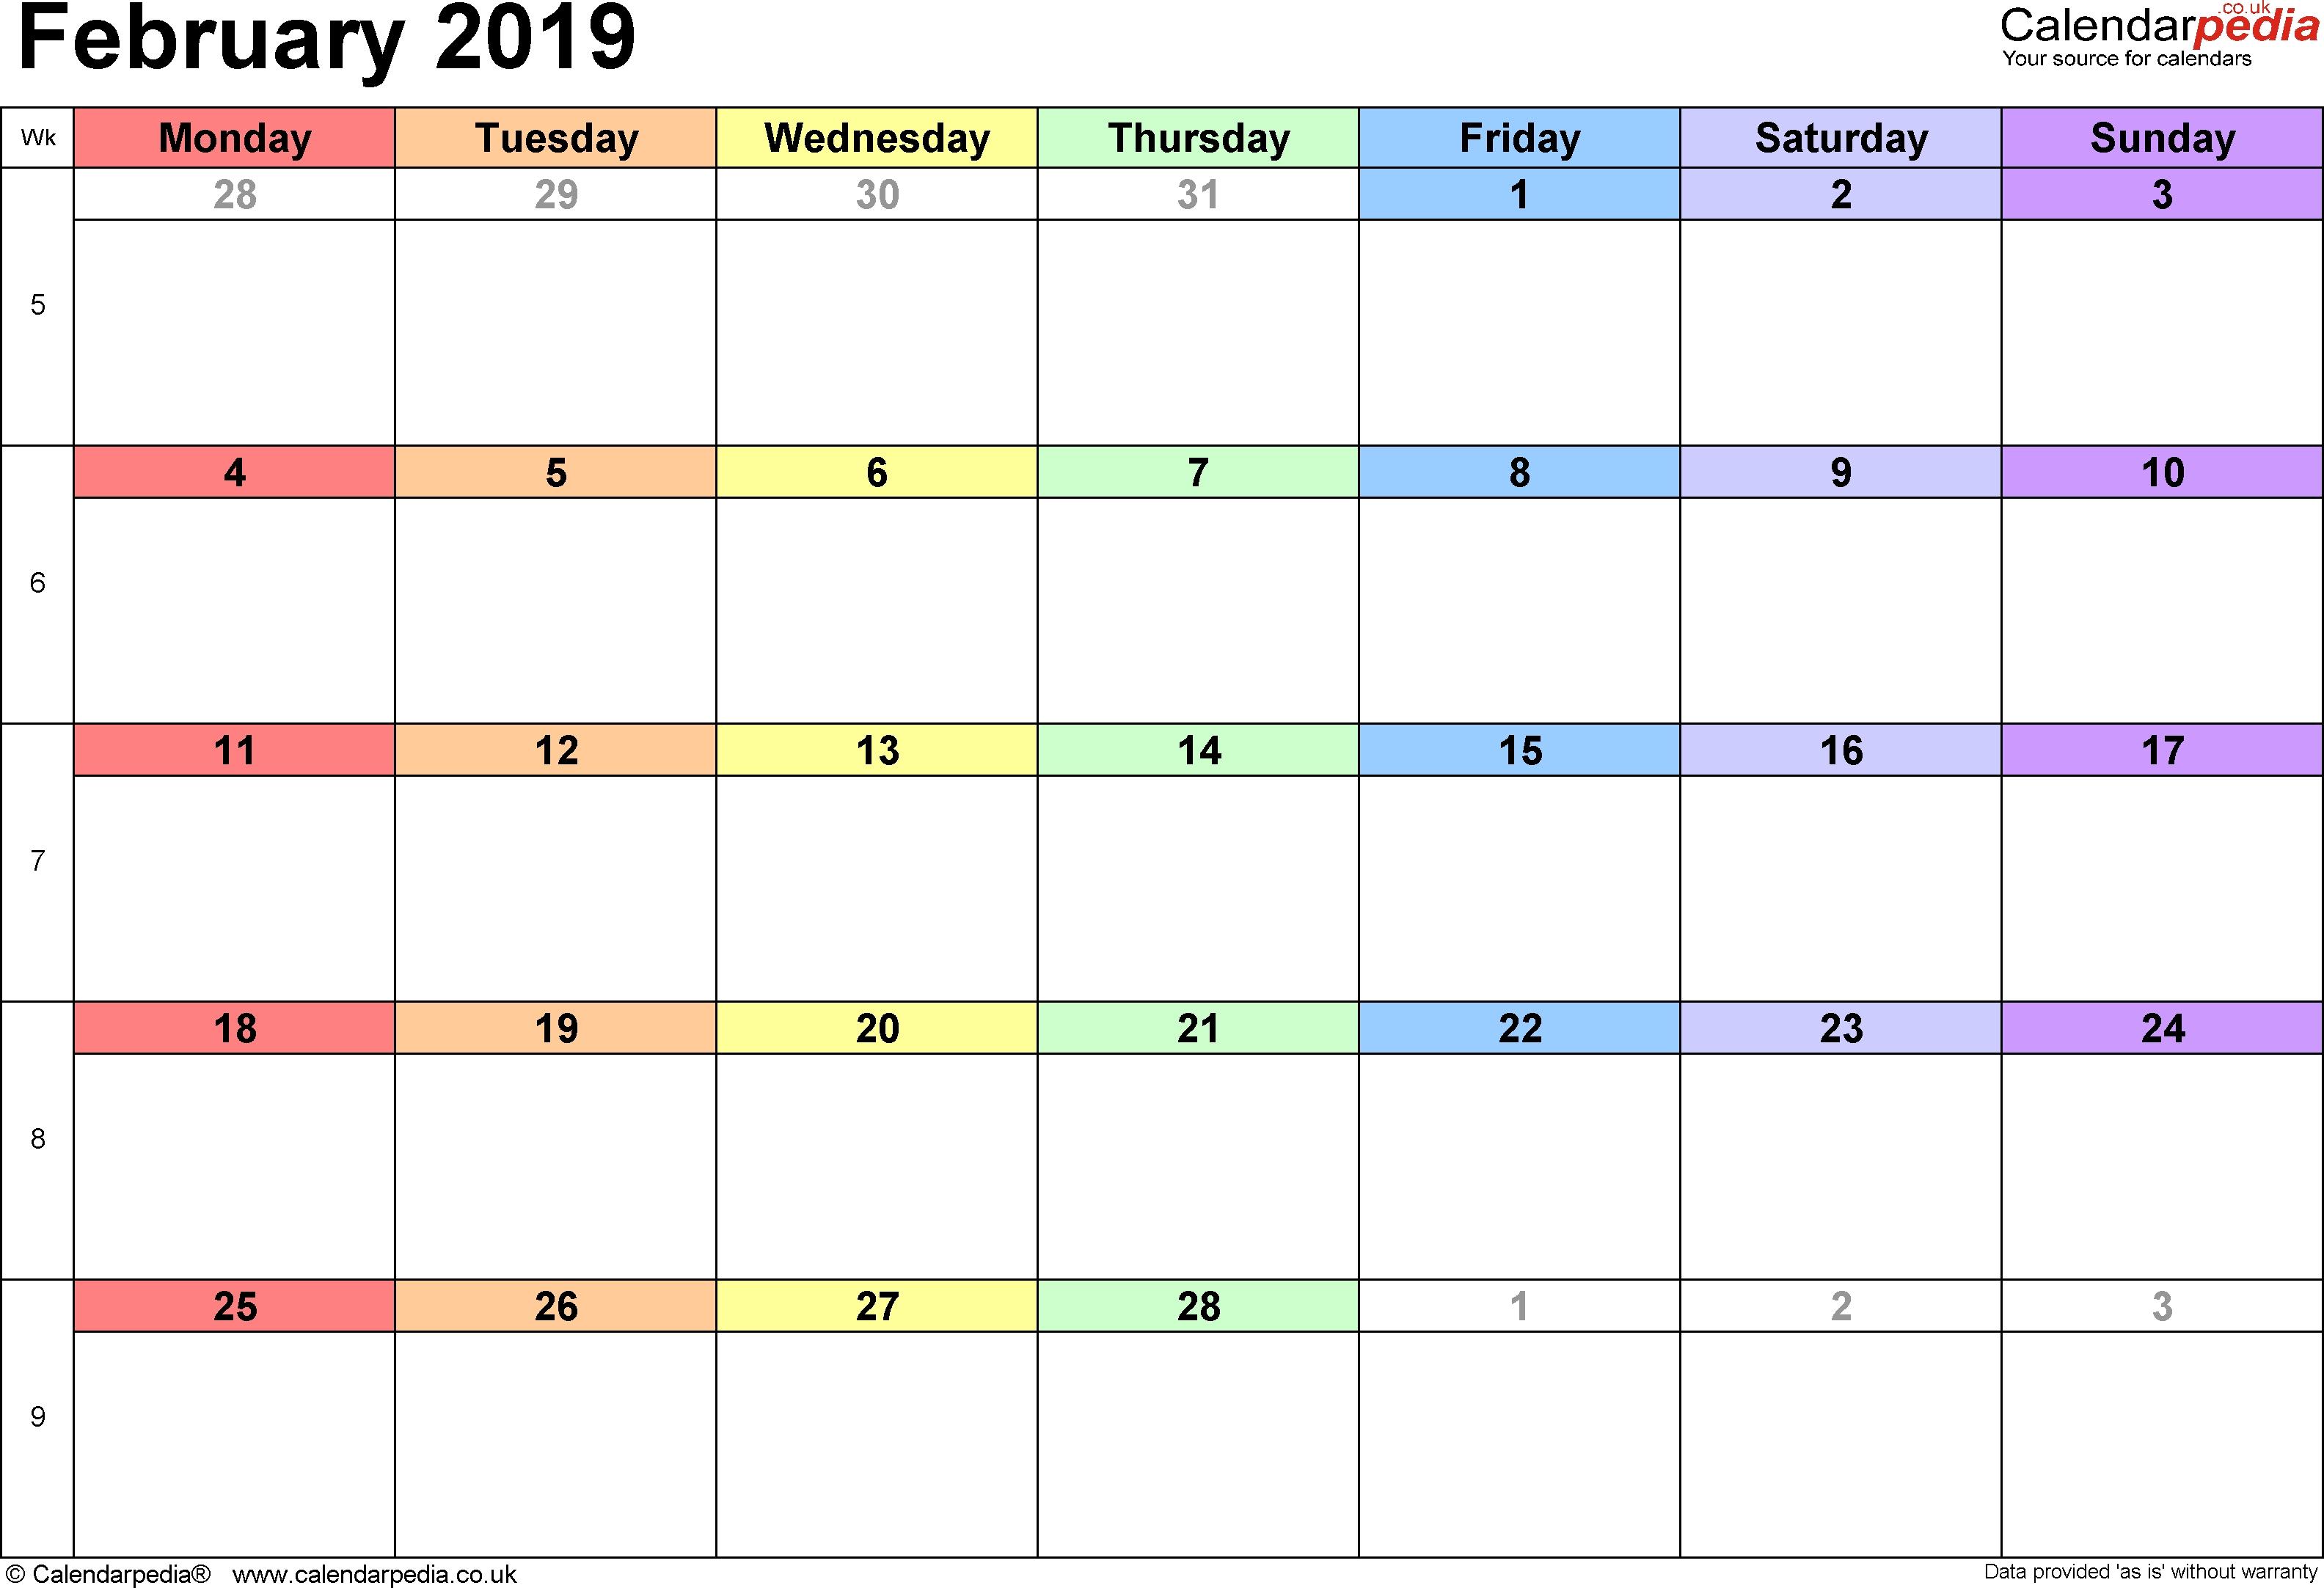 Calendar February 2019 Uk Bank Holidays Excelpdfword Templates